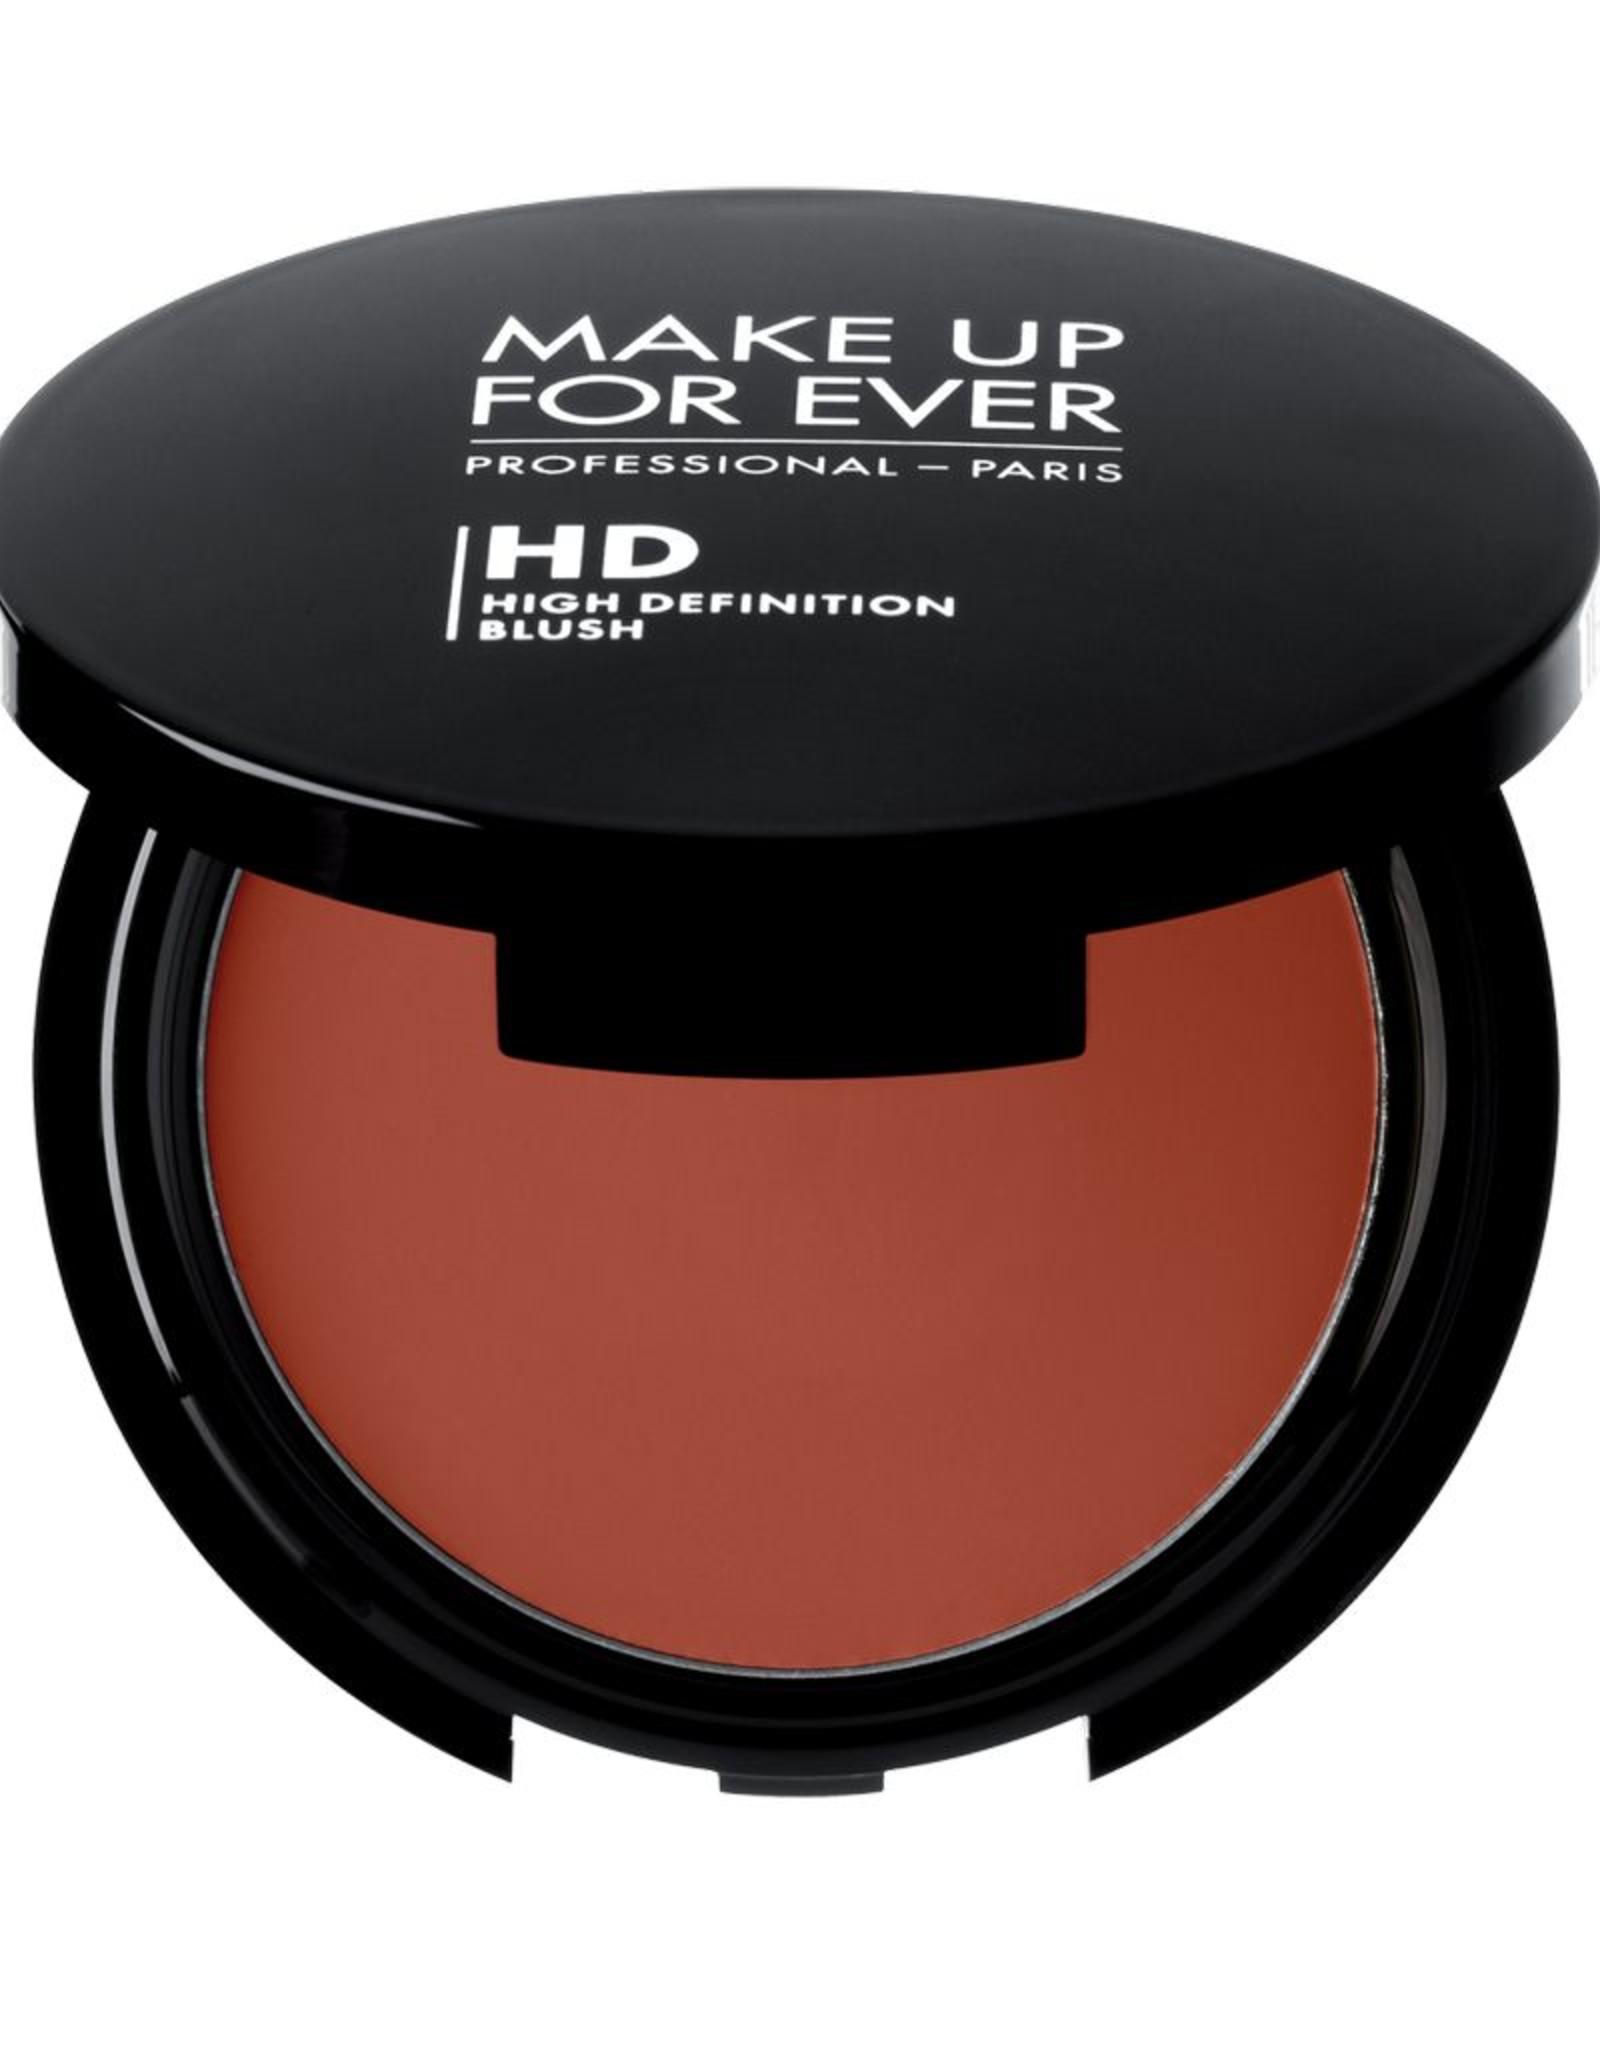 MUFE HD BLUSH CREME 2.8G#425: Brown Copper